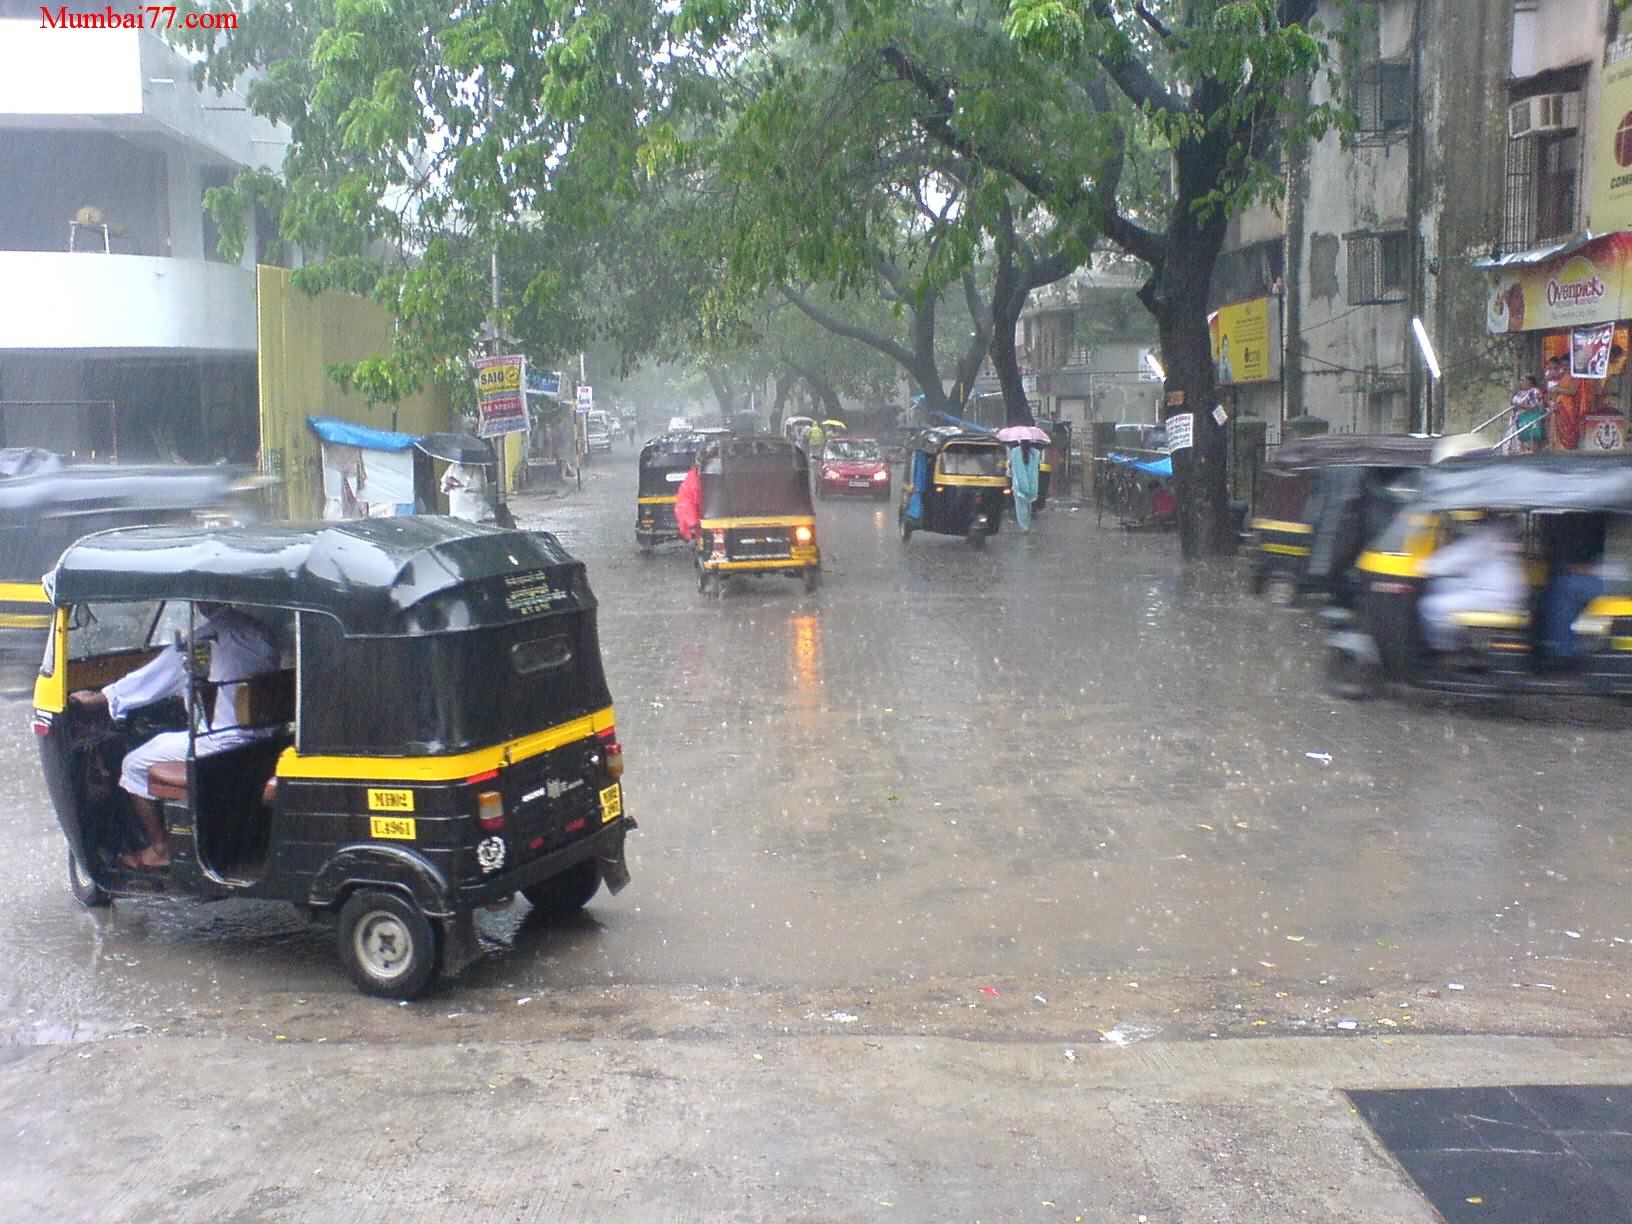 Auto Rickshaw in Mumbai